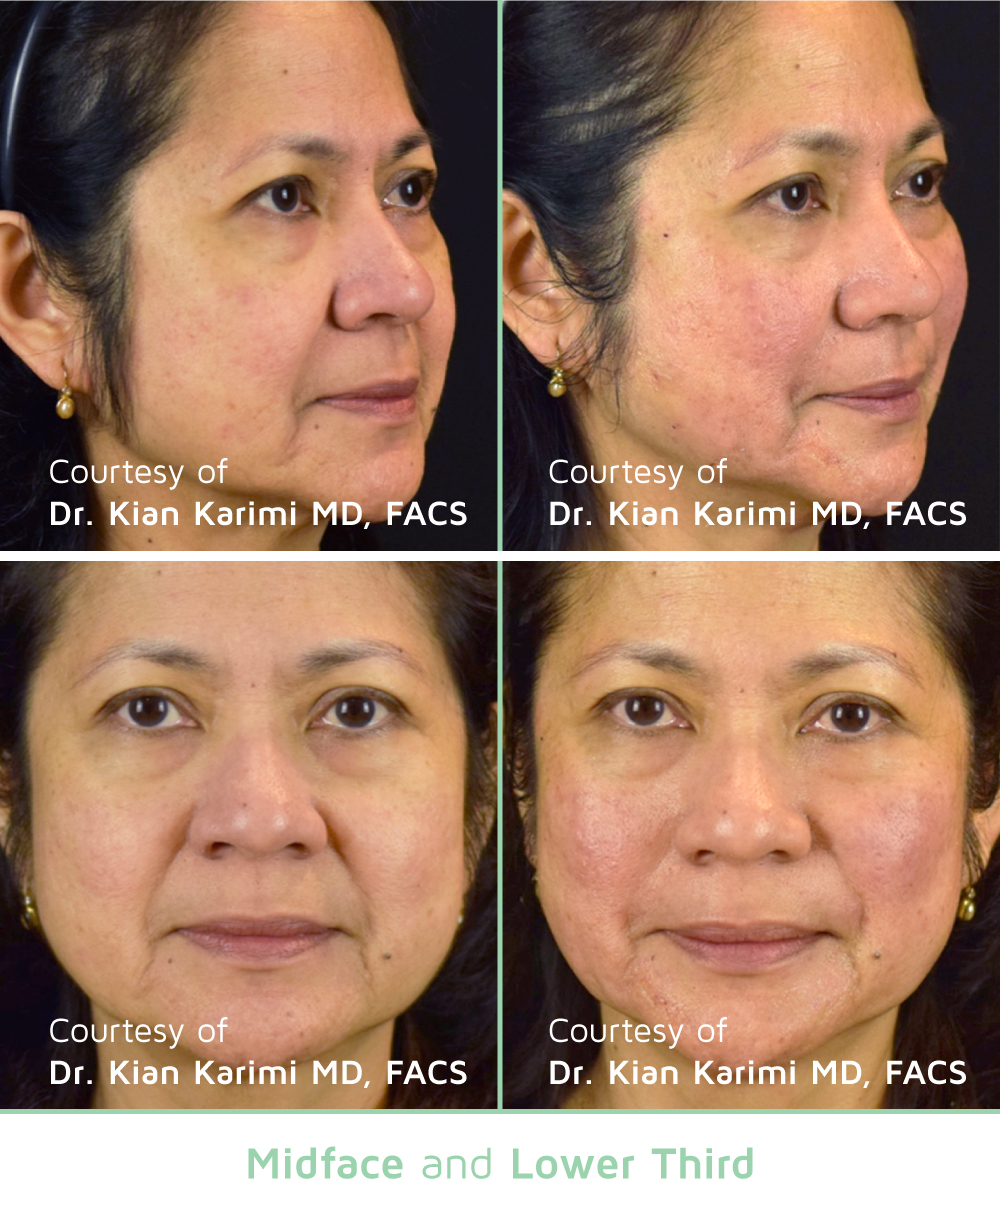 NovaThreads Midface & Lower third- Courtesy of Dr. Kian Karimi